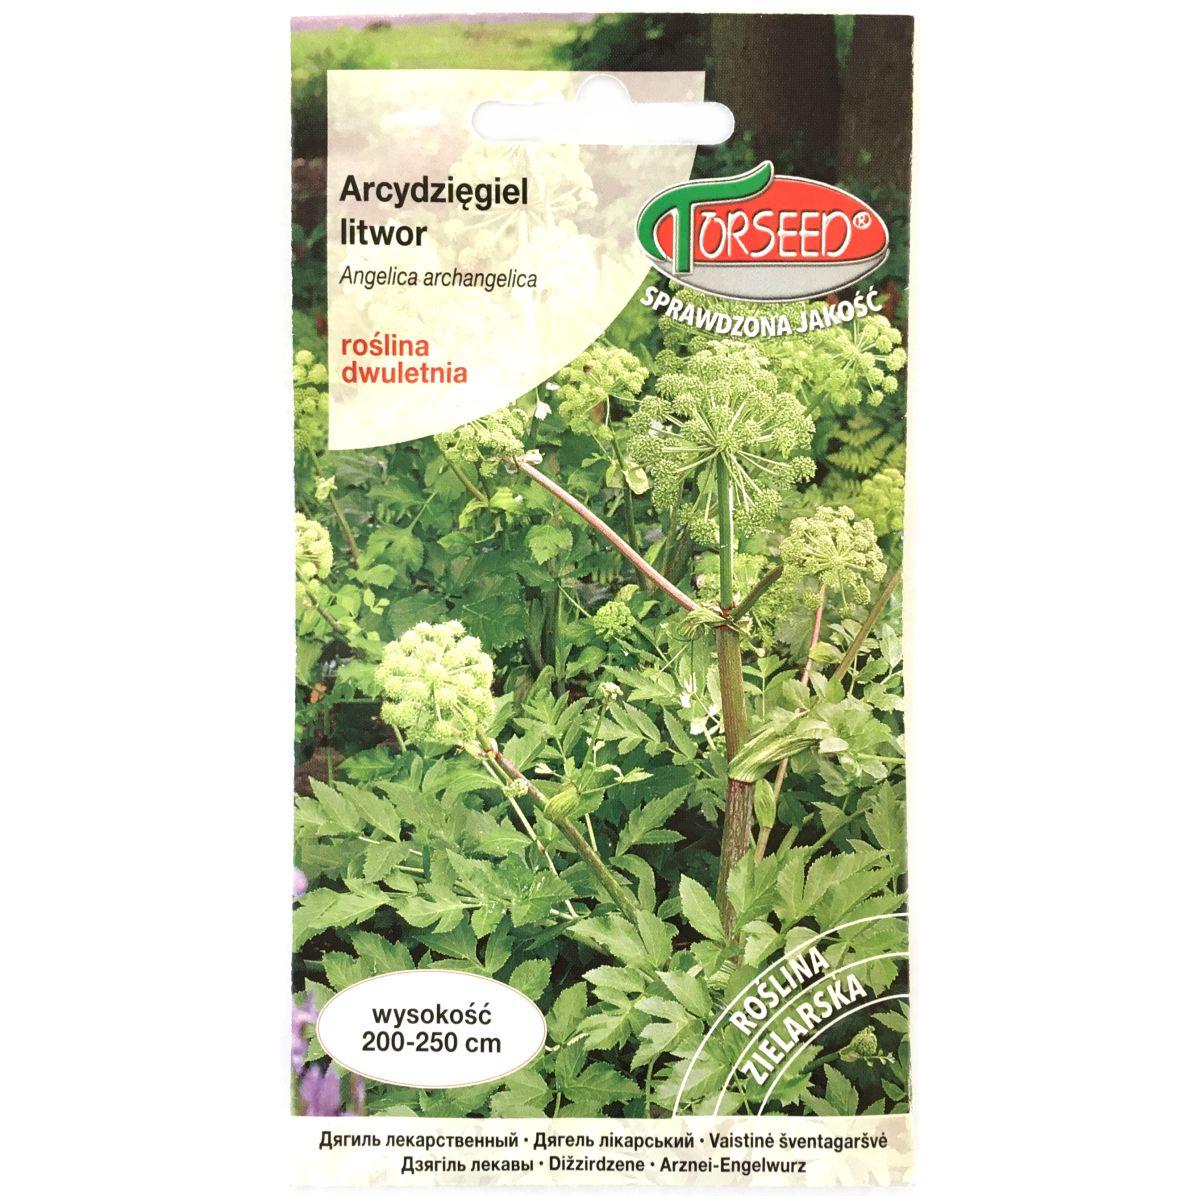 Arcydzięgiel litwor nasiona Torseed